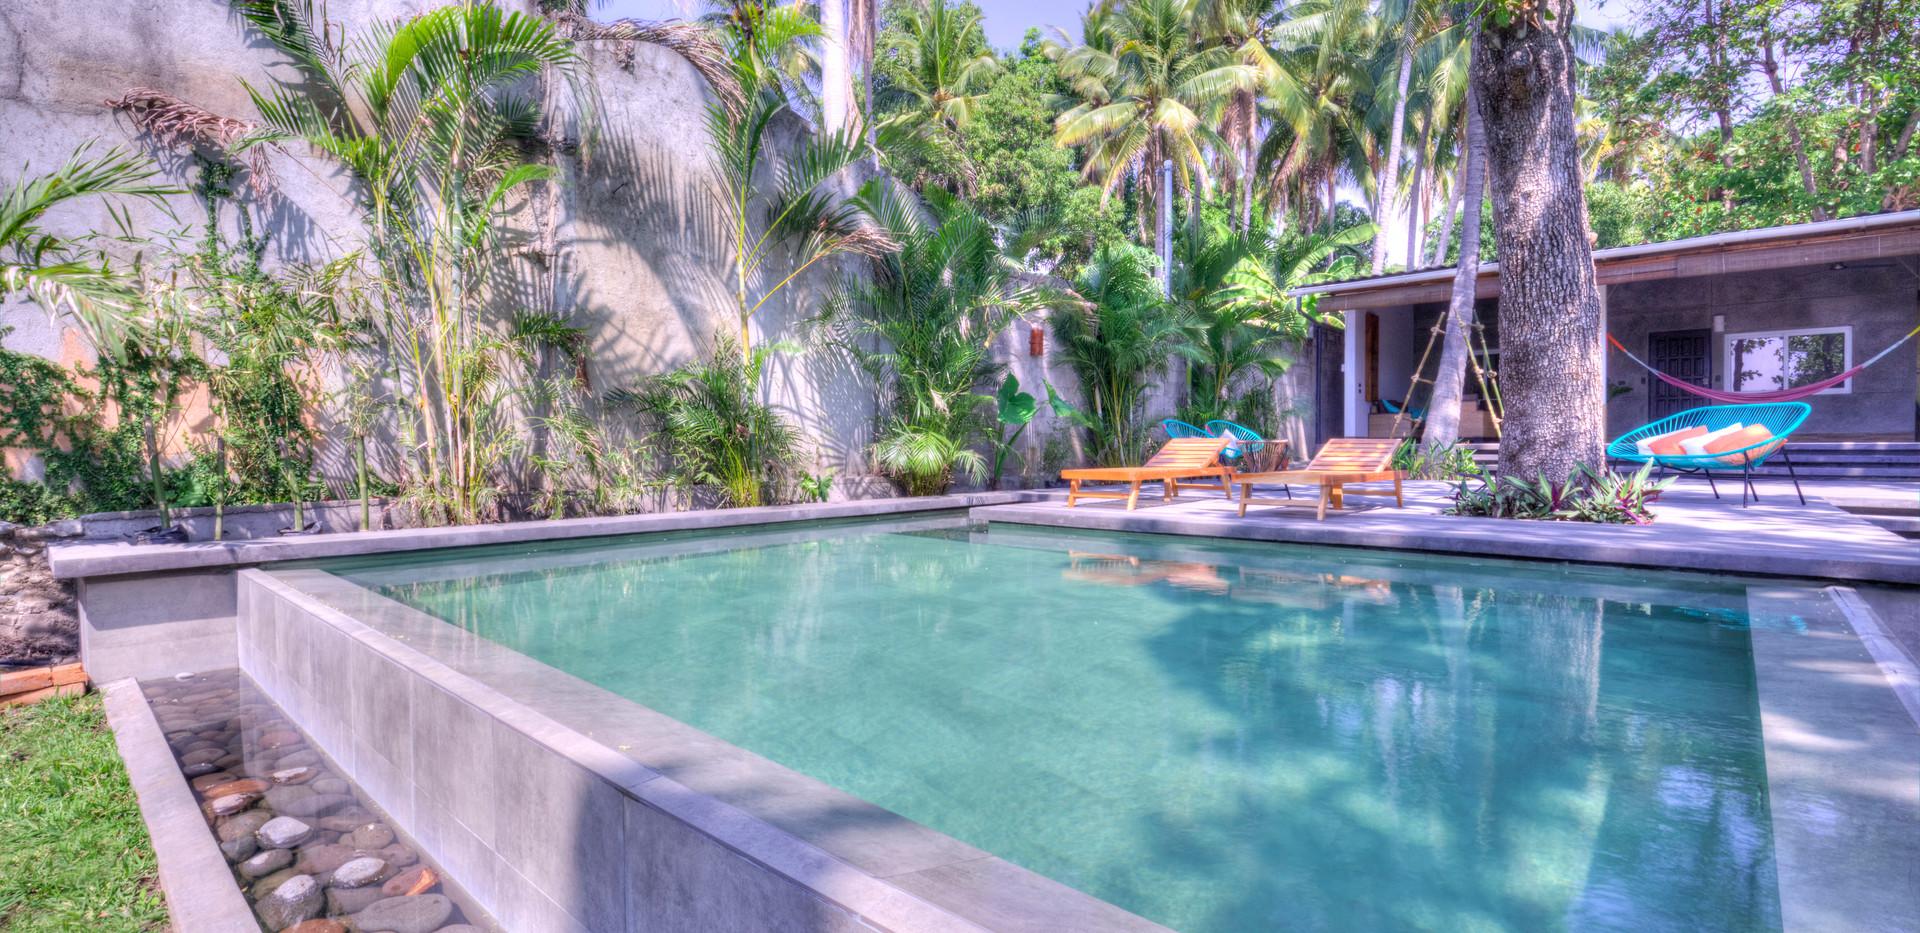 B - Yoga Deck _ Pool 3.jpg